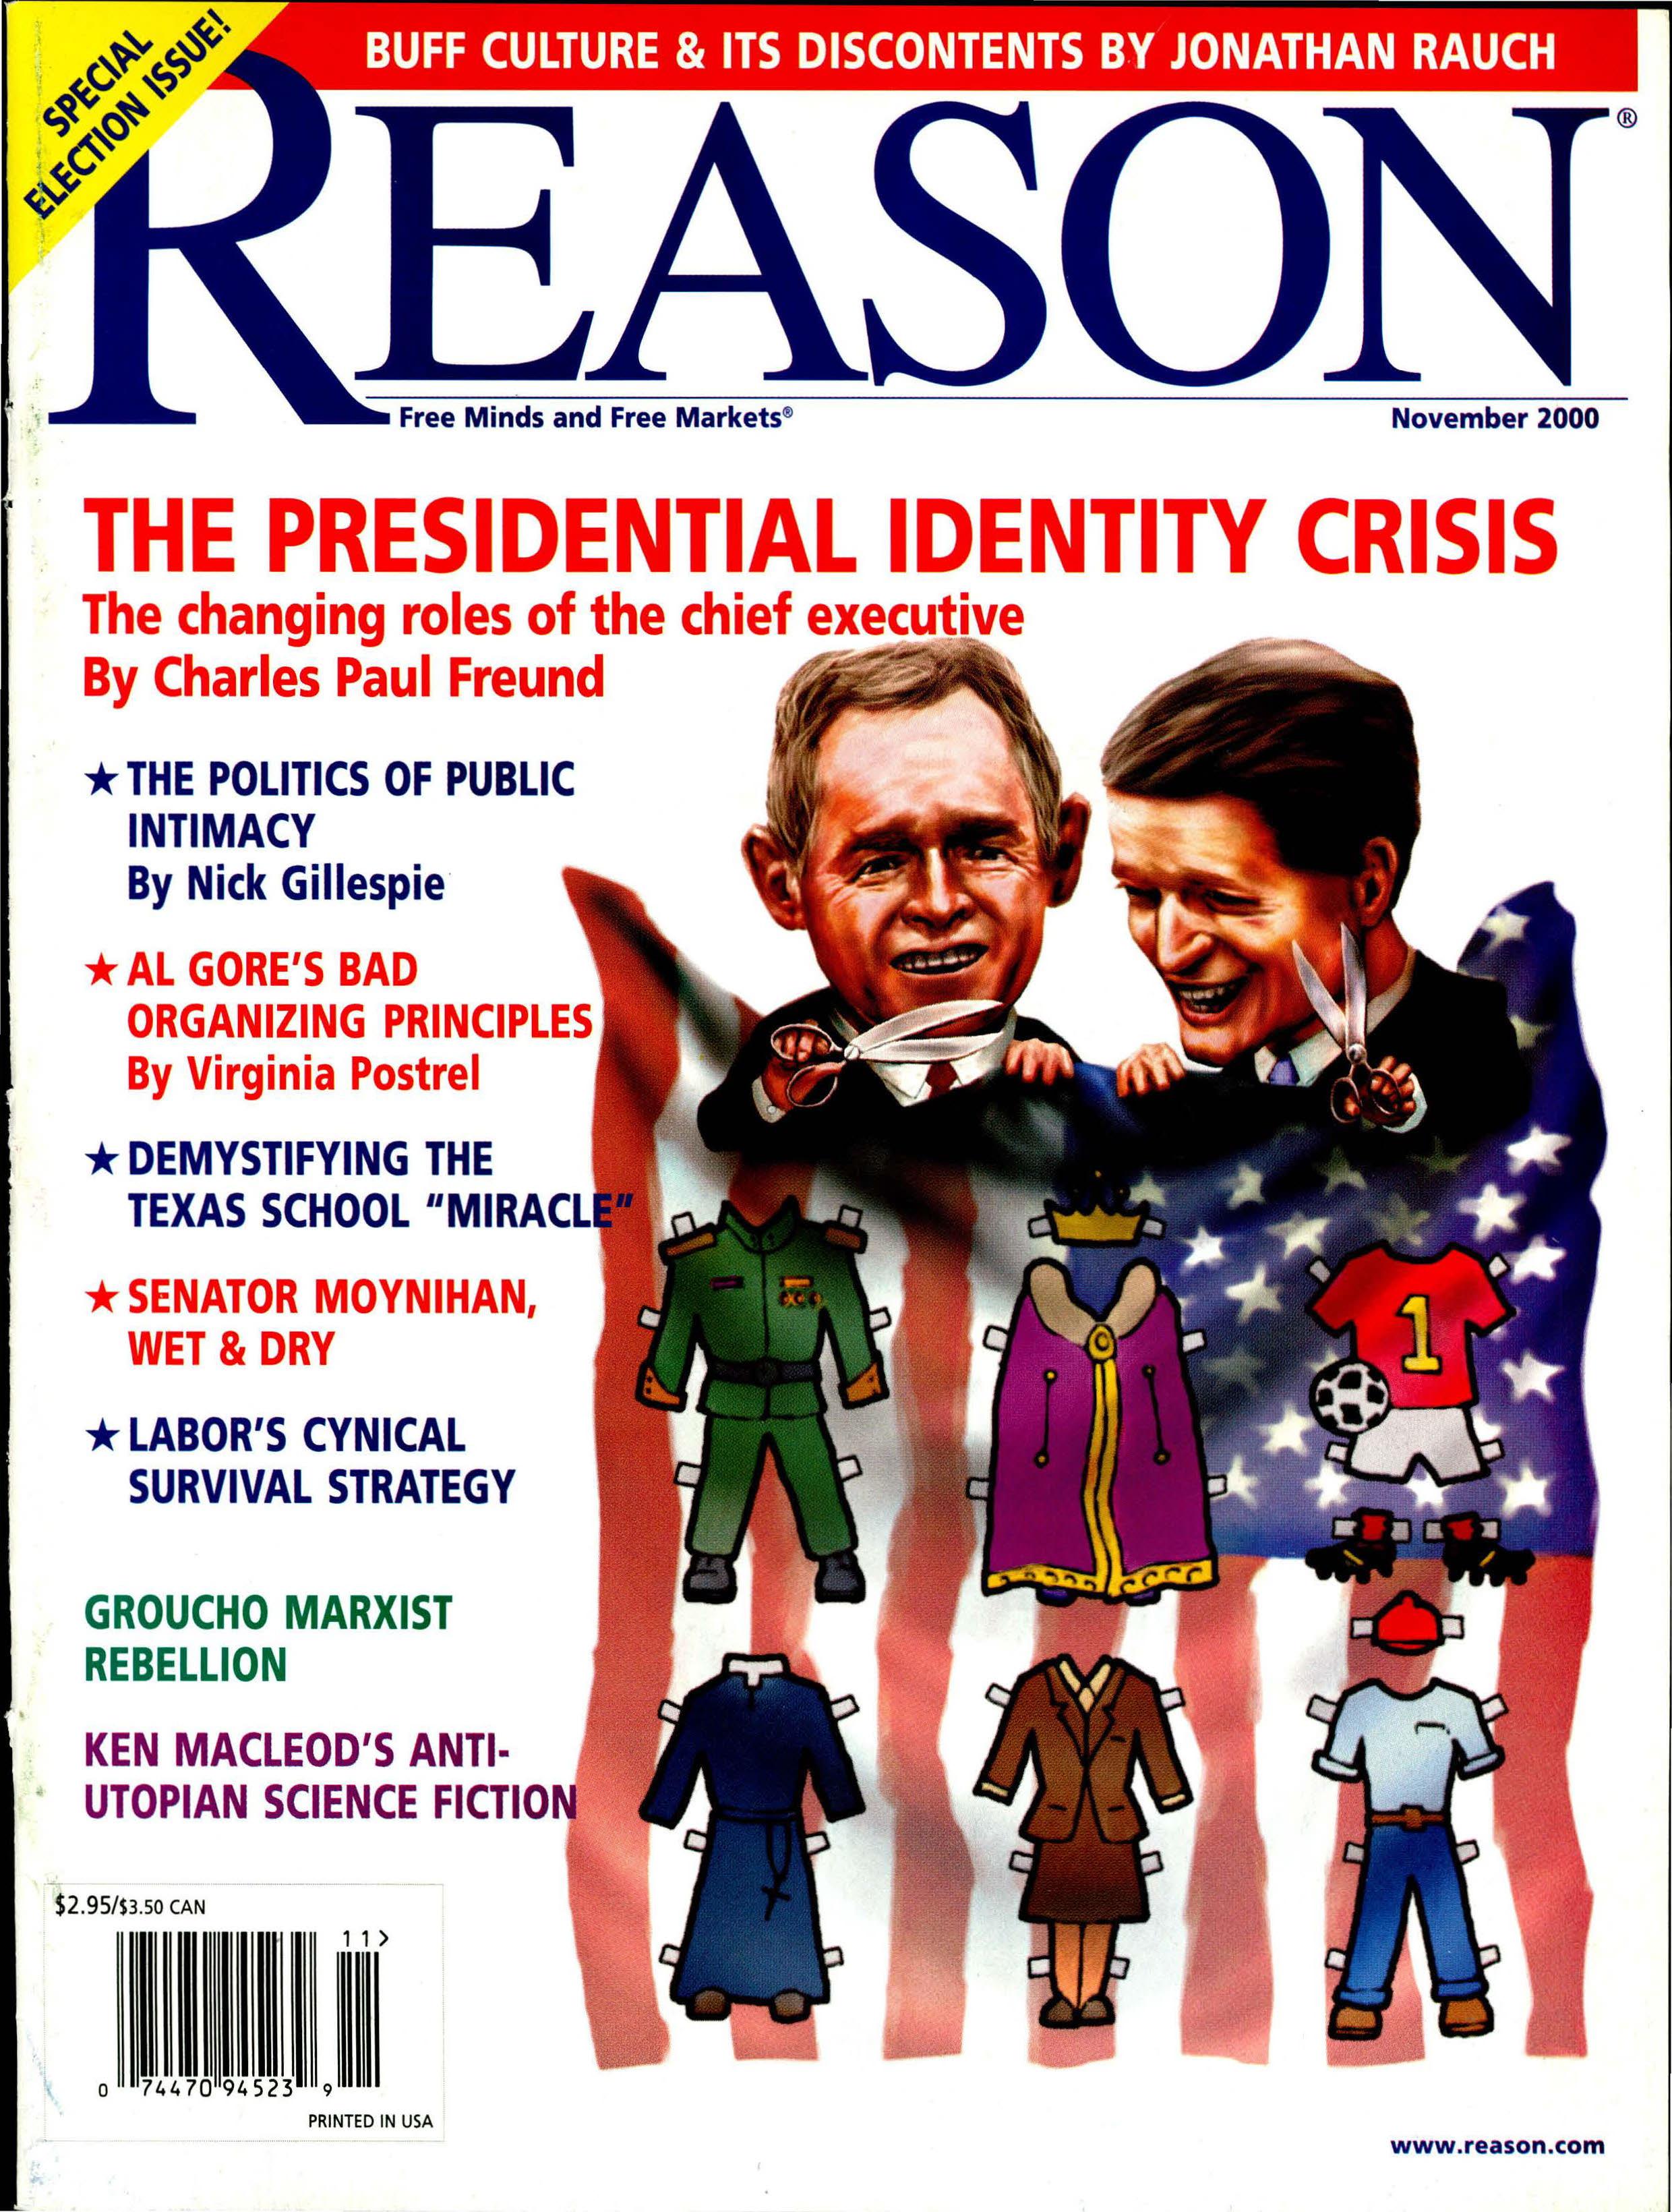 Reason Magazine, November 2000 cover image